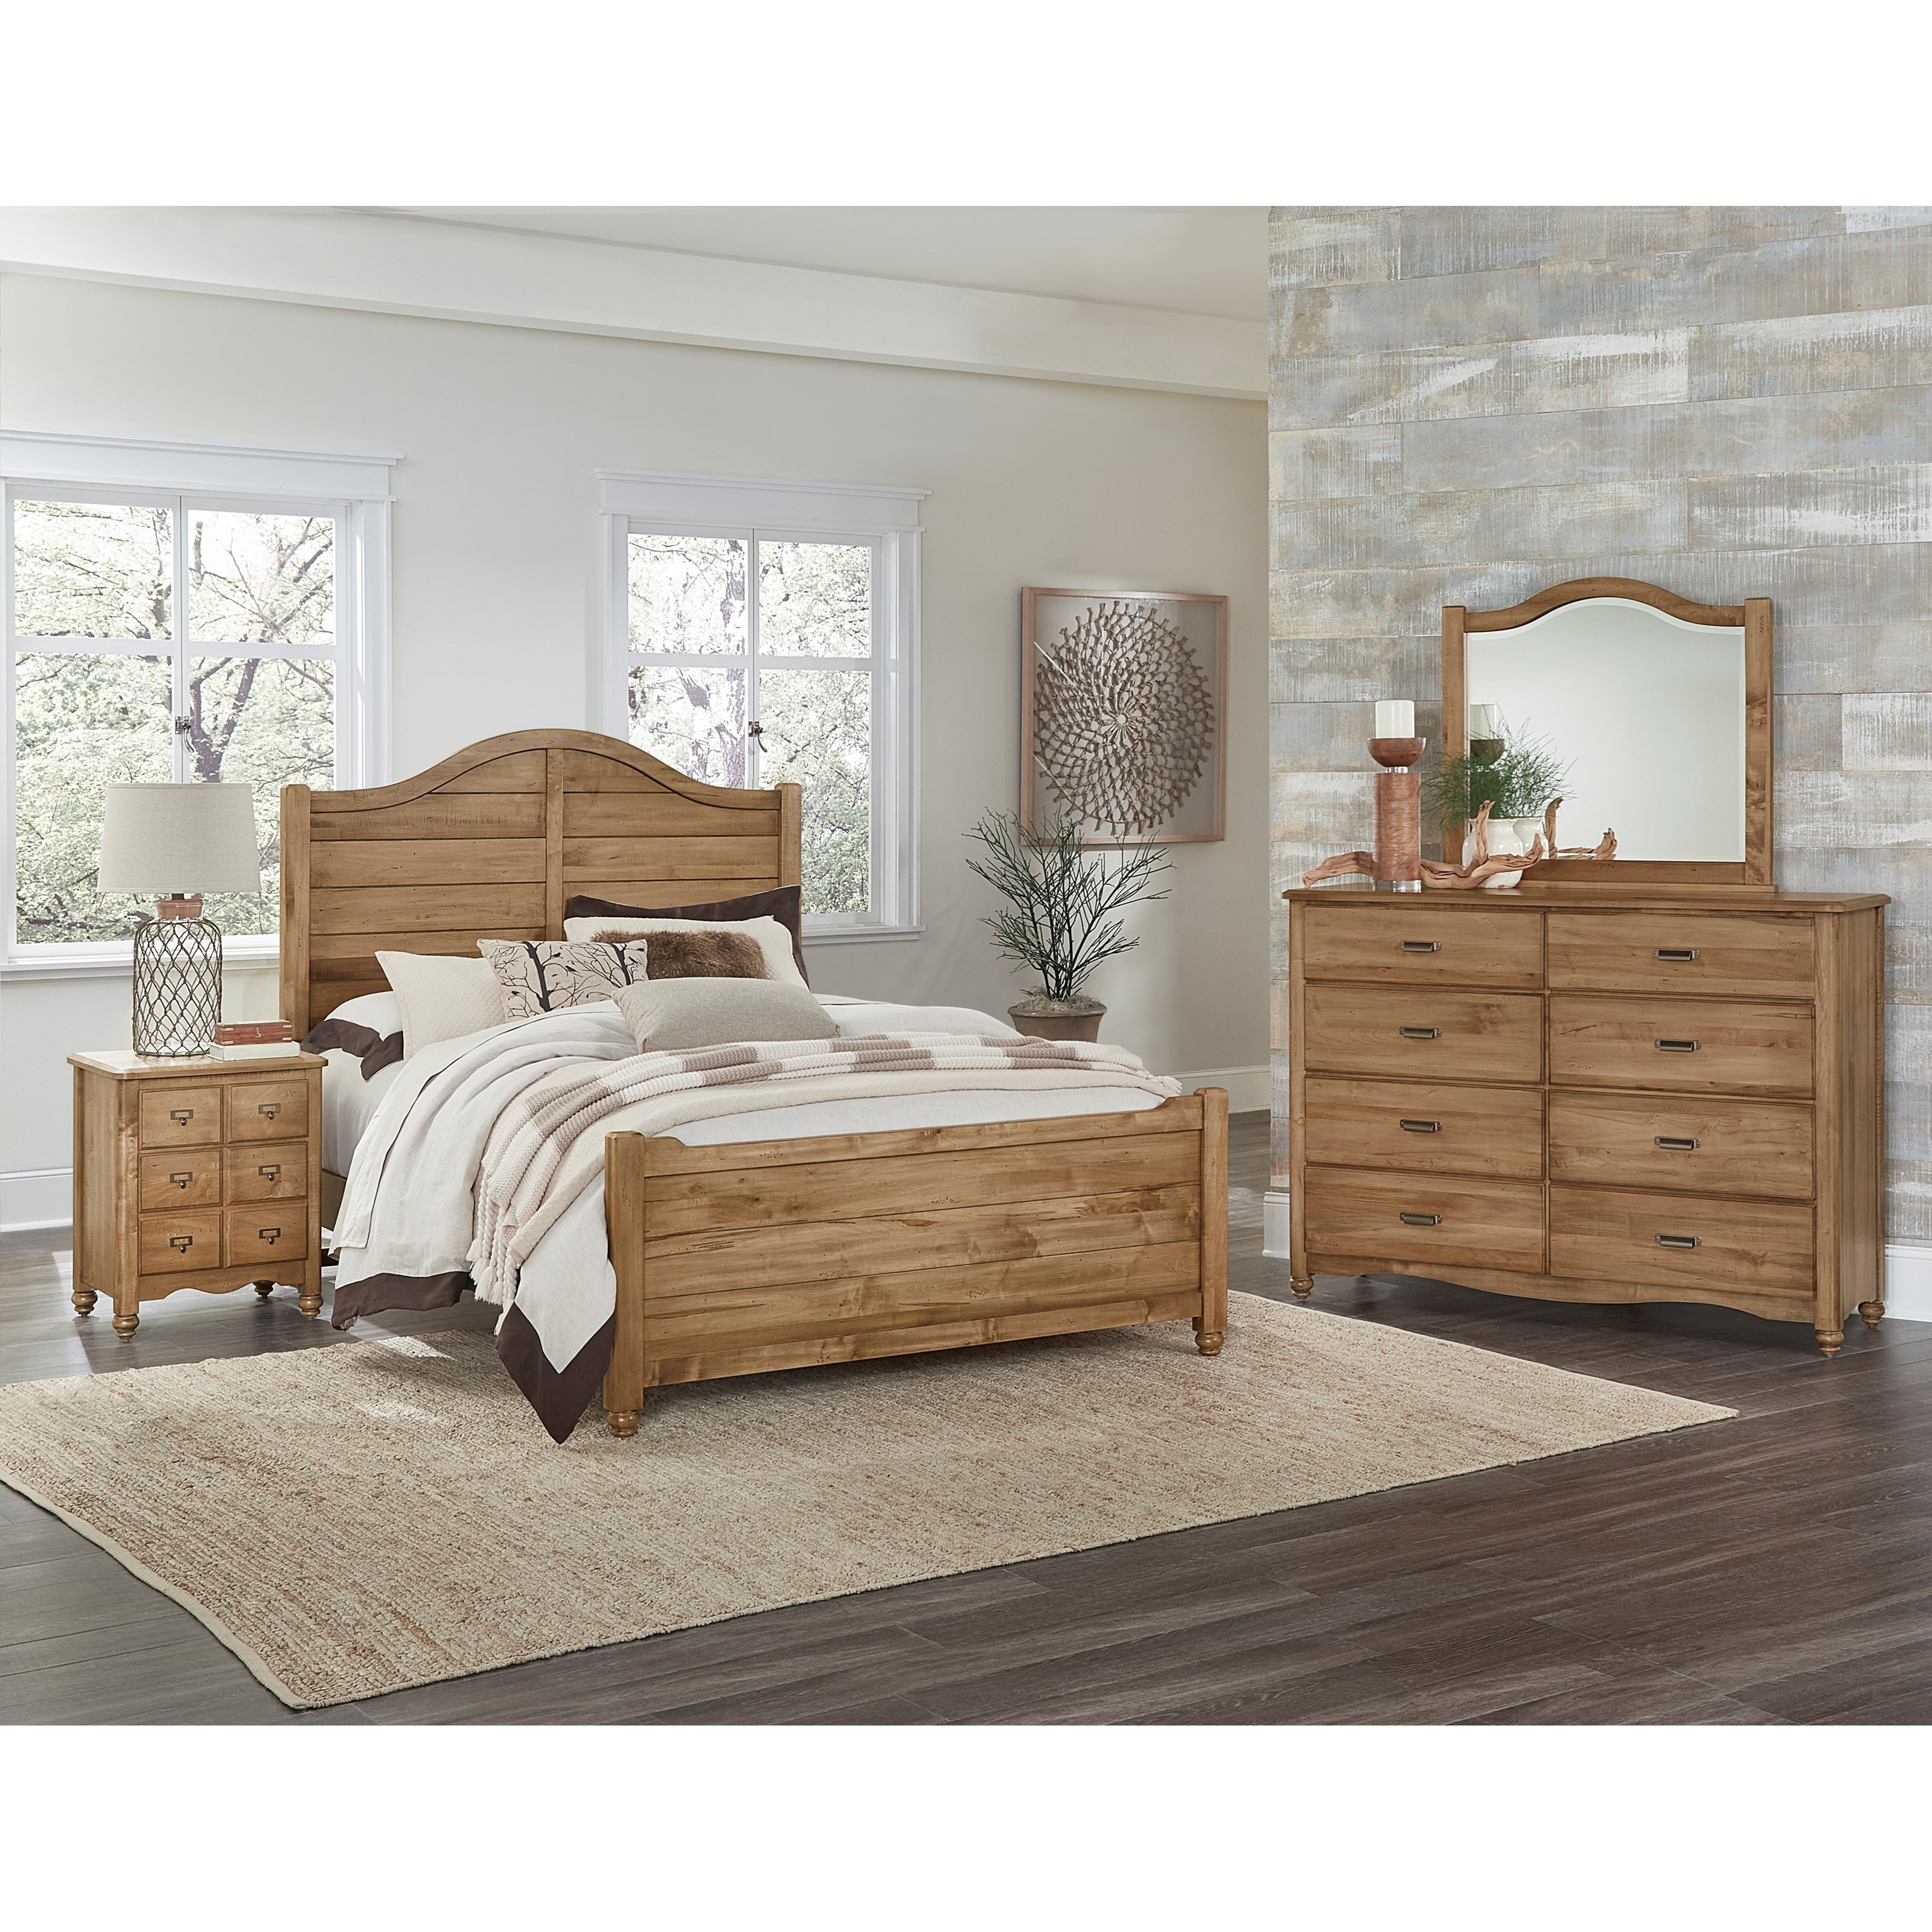 Vaughan bassett american maple solid wood full shiplap bed